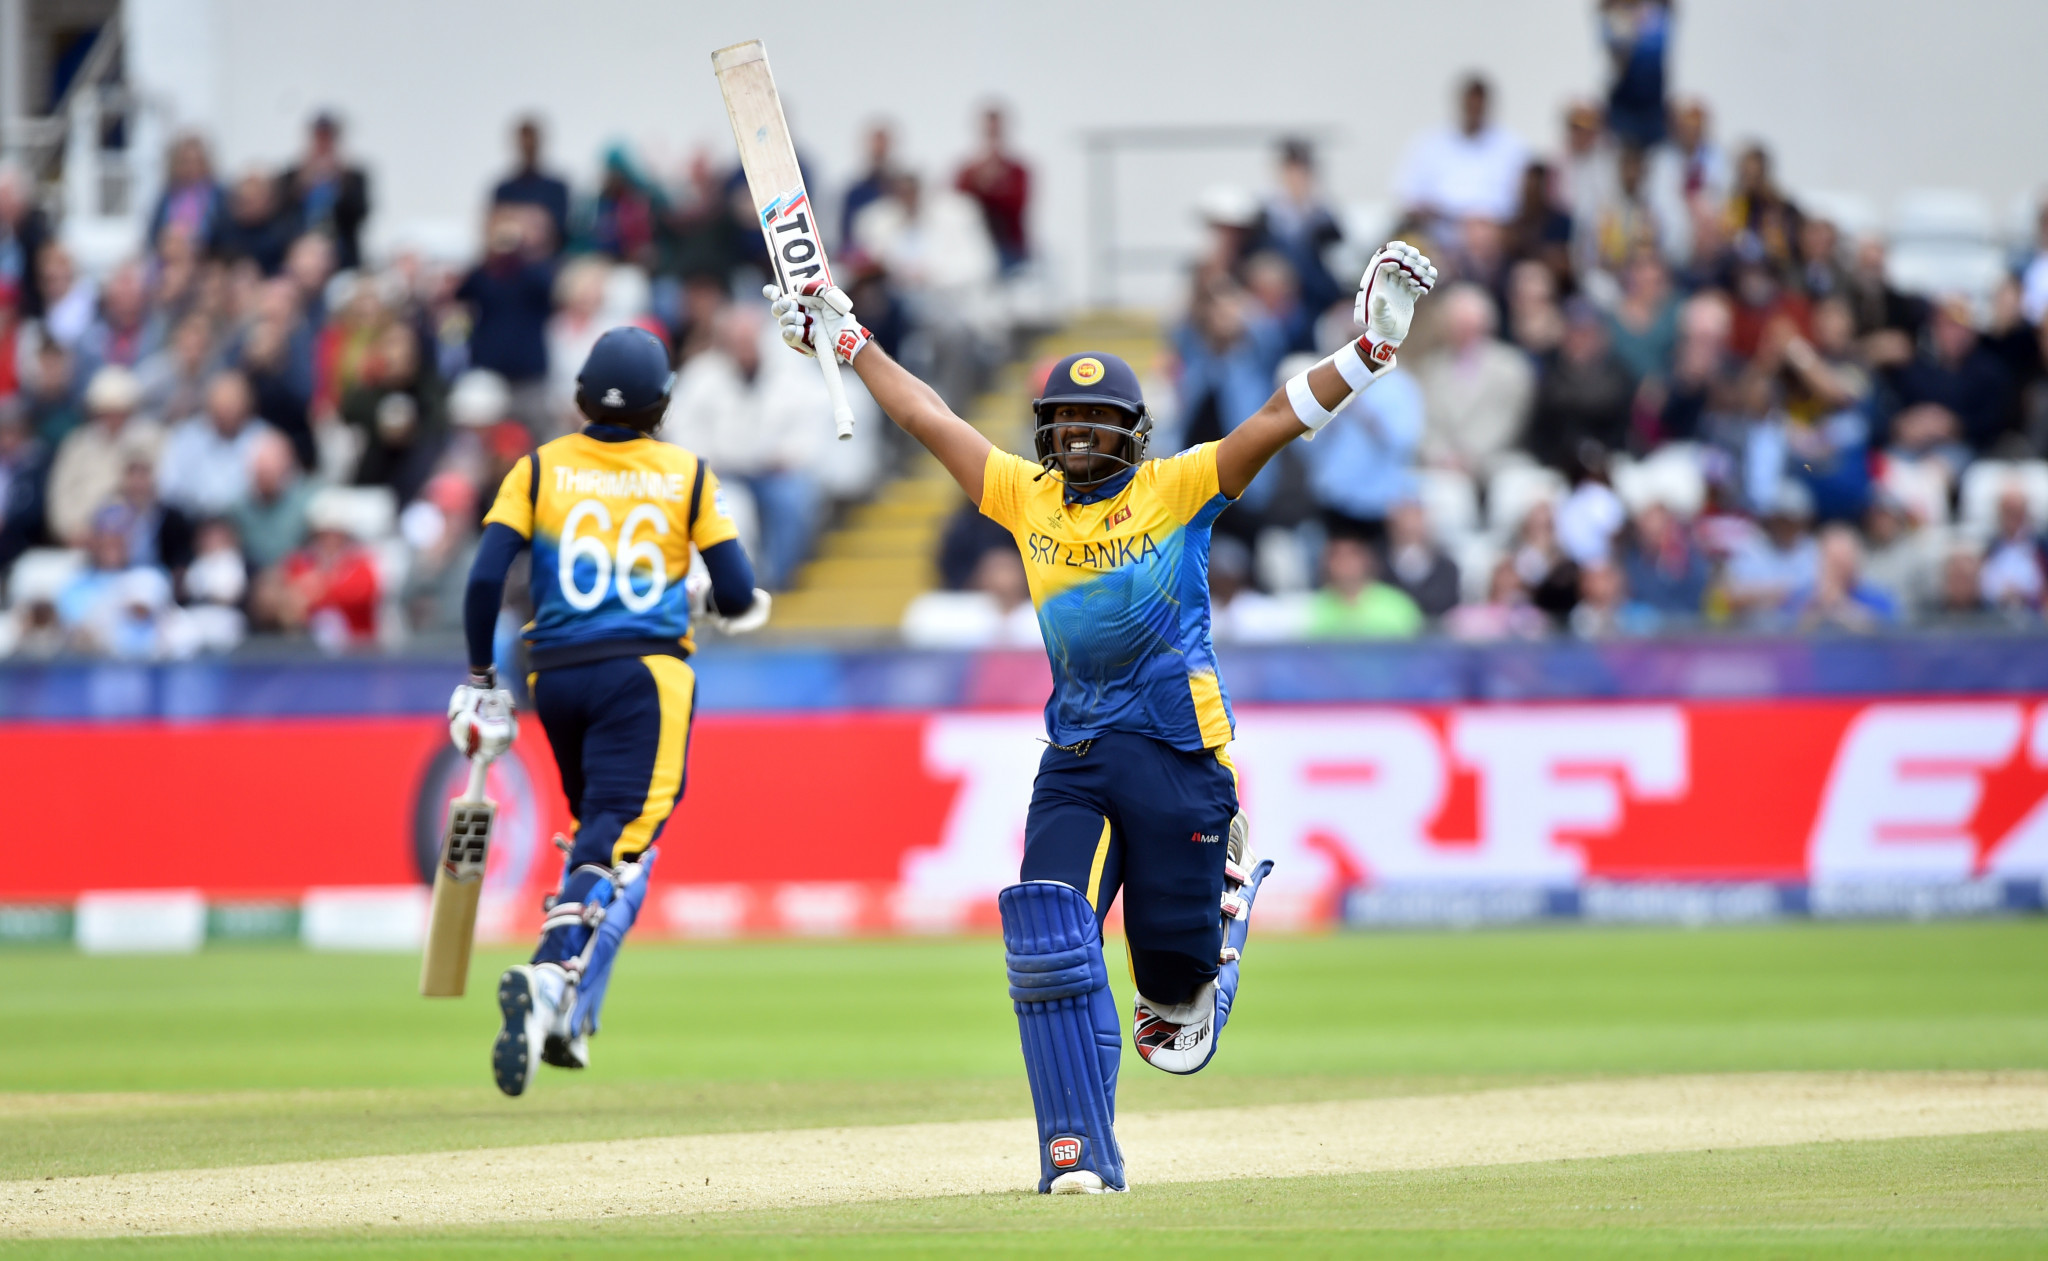 Fernando and Pooran star as Sri Lanka edge West Indies at ICC Cricket World Cup